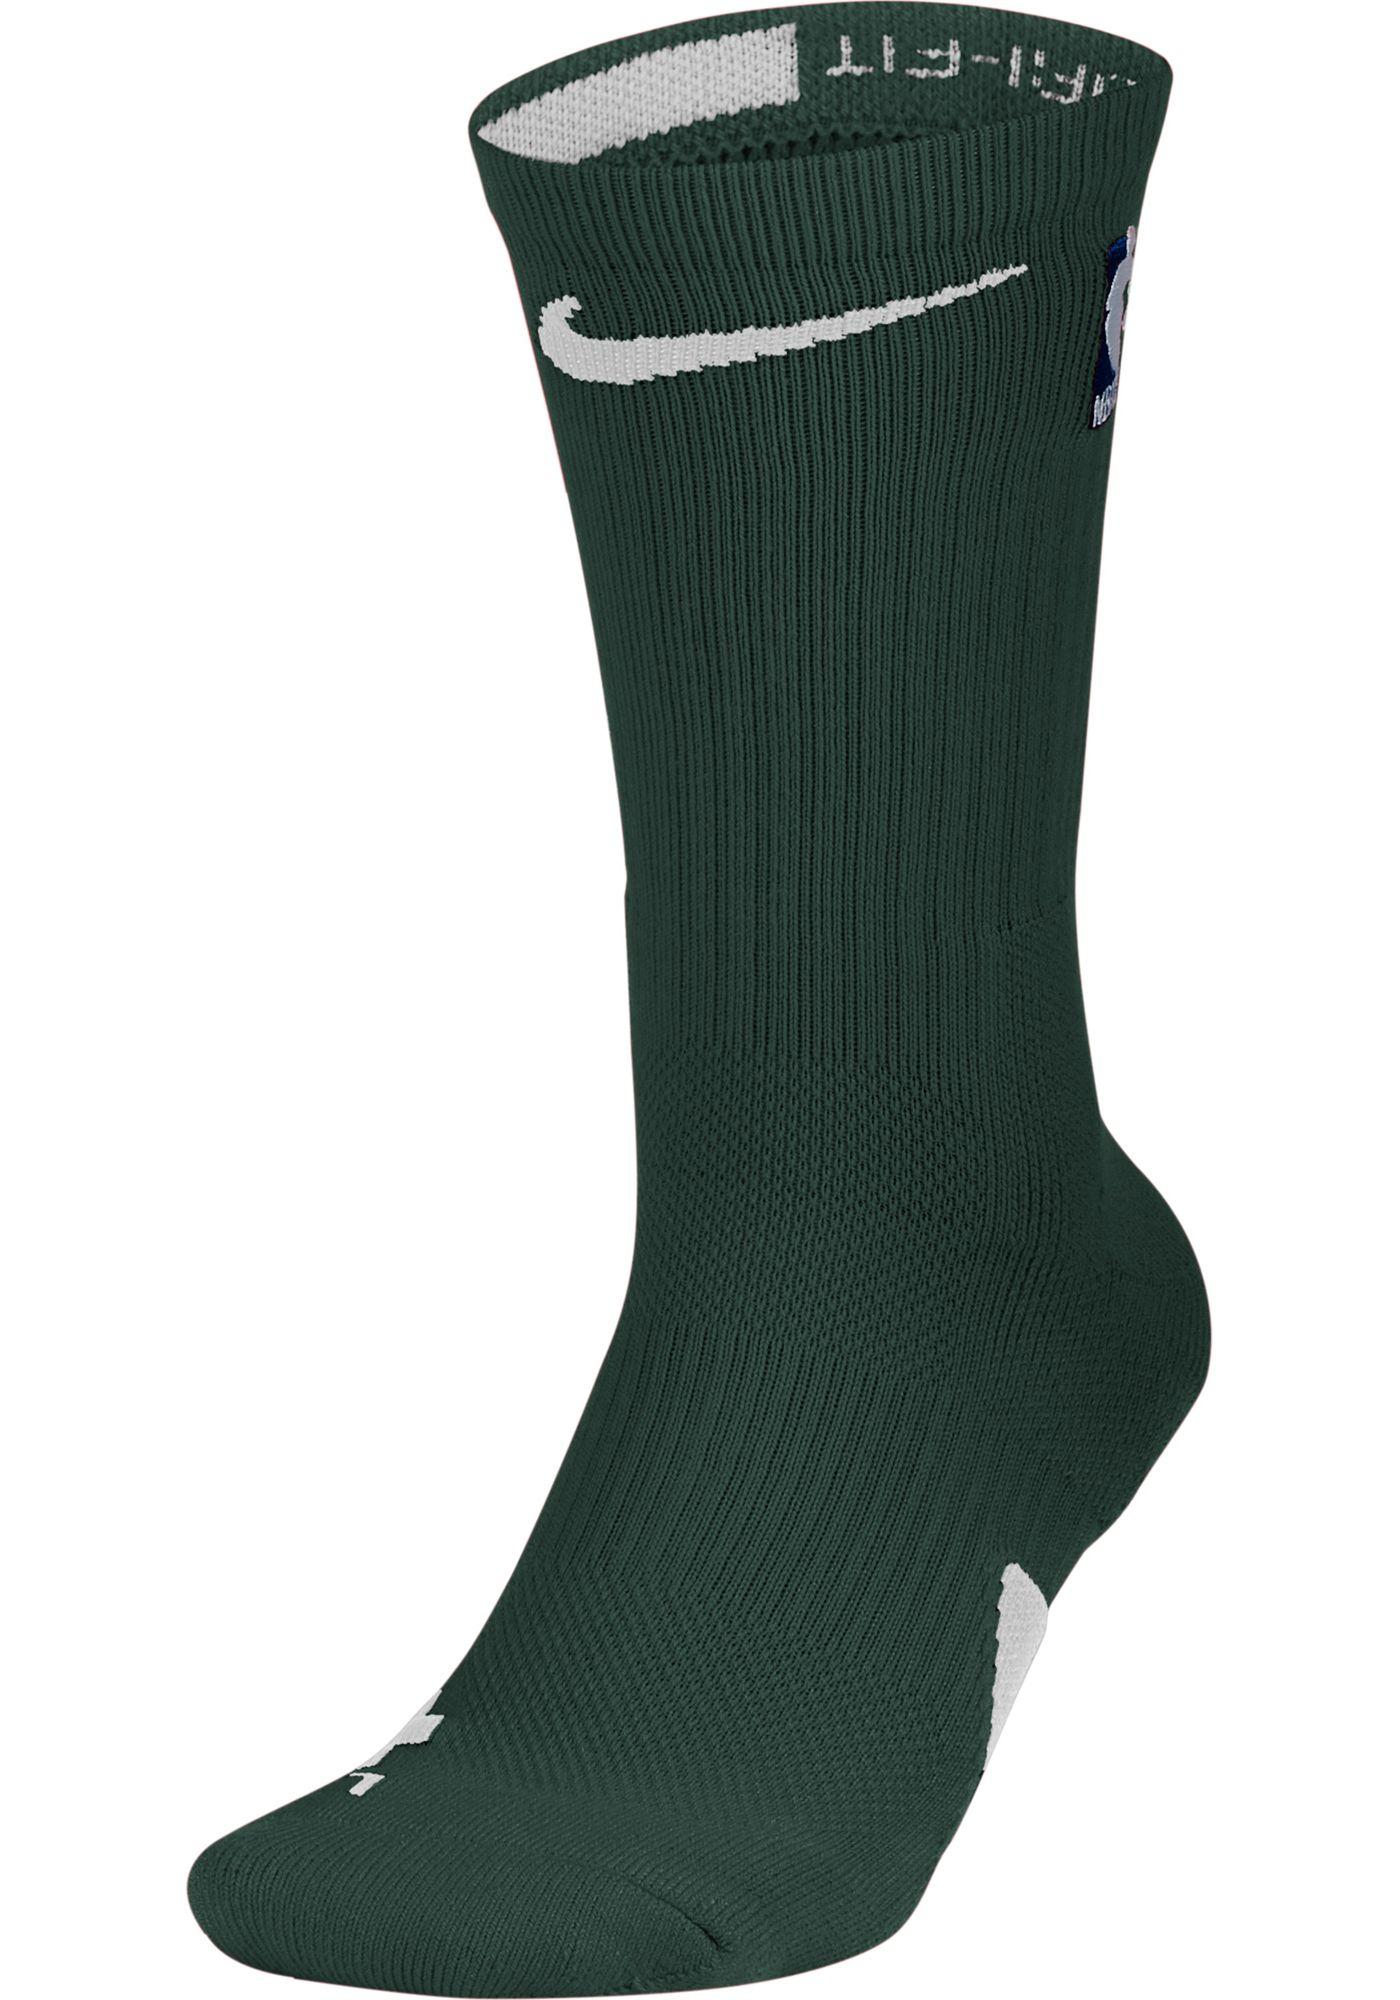 Nike NBA League Dark Green Elite Crew Socks